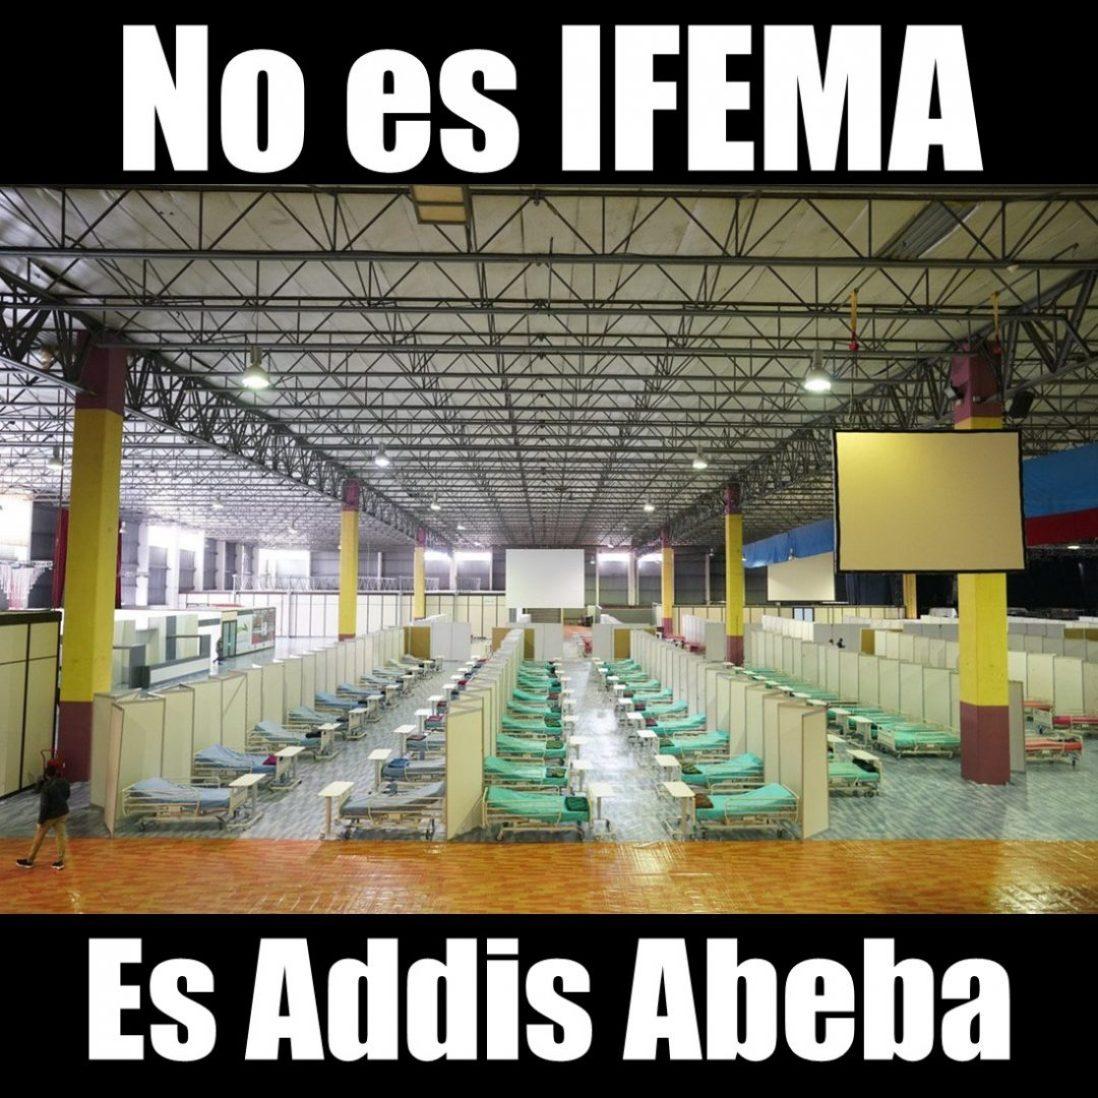 No es IFEMA, es Addis Abeba africa alegria gambo alegria sin fronteras etiopia gambo